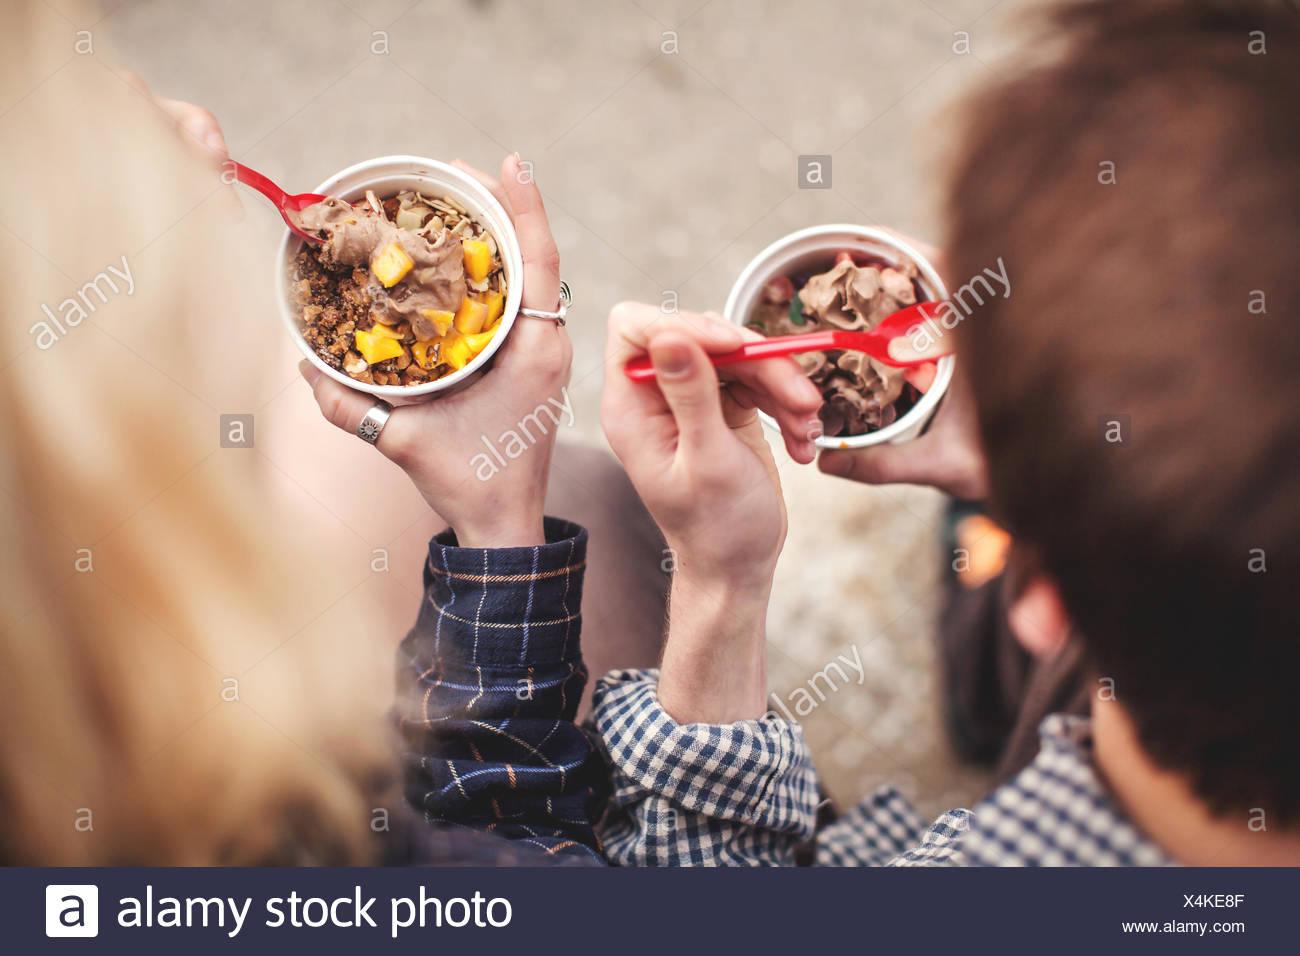 Couple eating tubs of frozen yoghurt treat - Stock Image